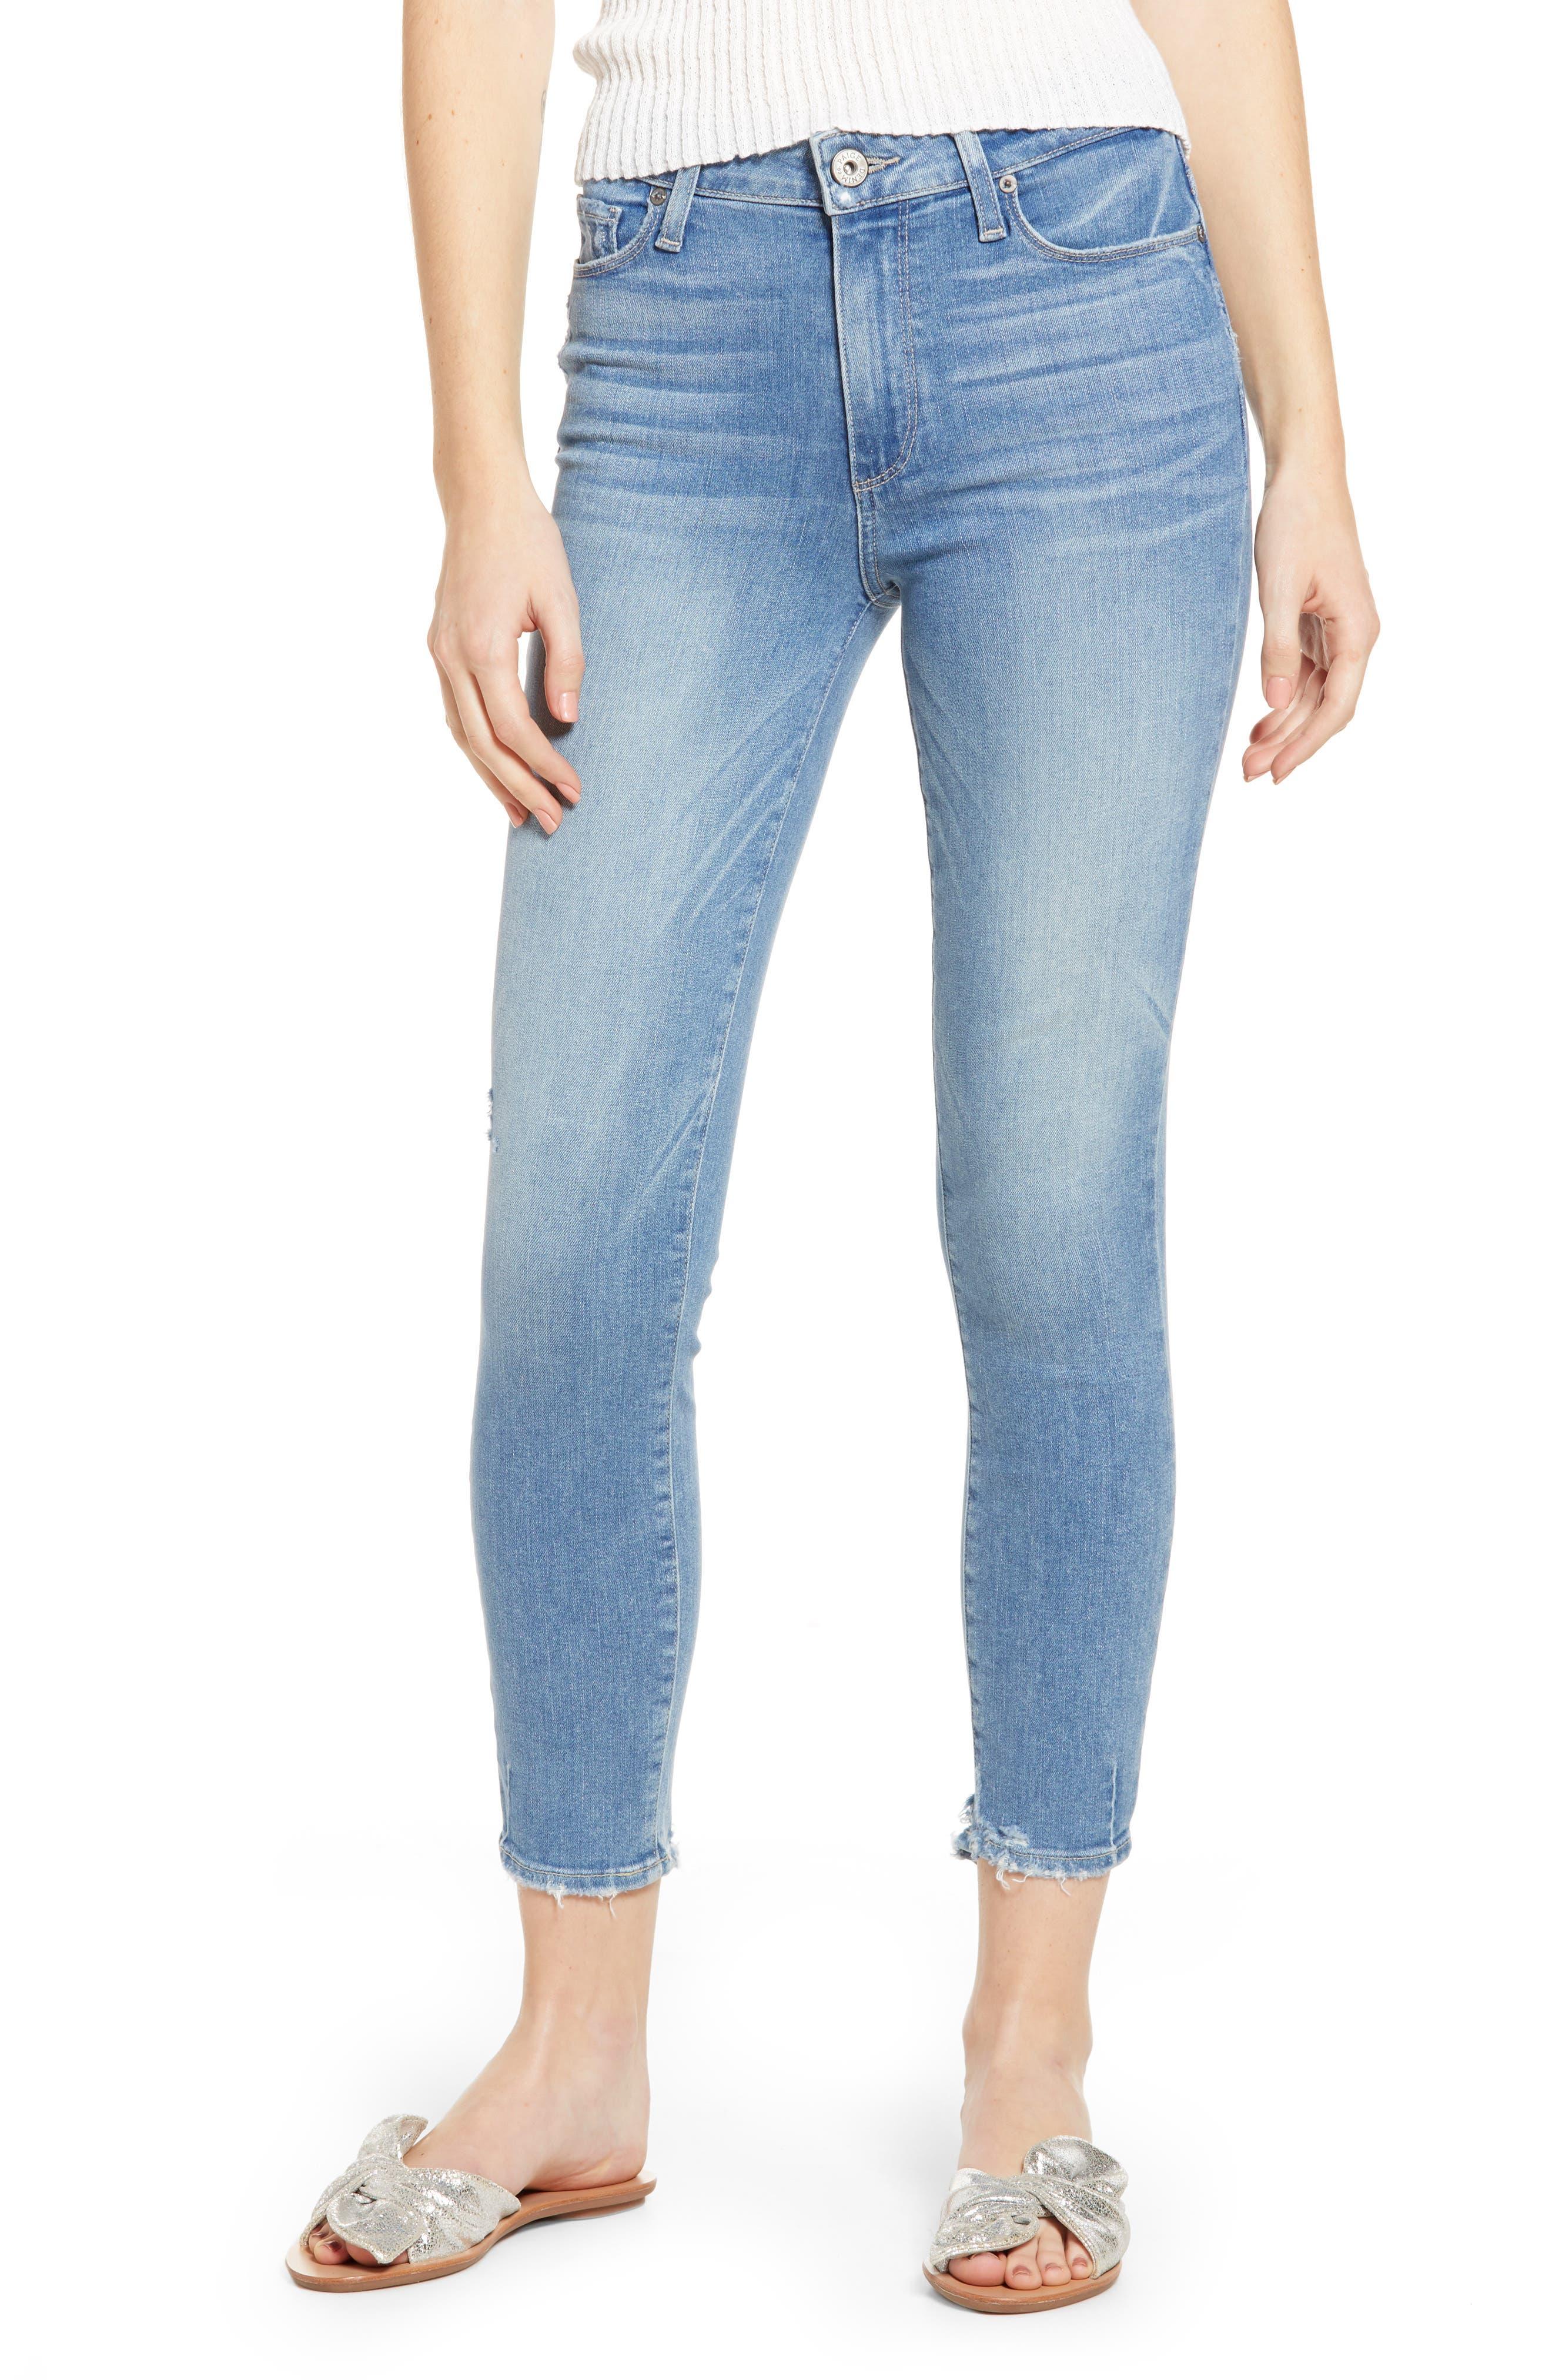 PAIGE, Hoxton Transcend Vintage High Waist Crop Skinny Jeans, Main thumbnail 1, color, ATTERBURY W/ TORN BACK HEM